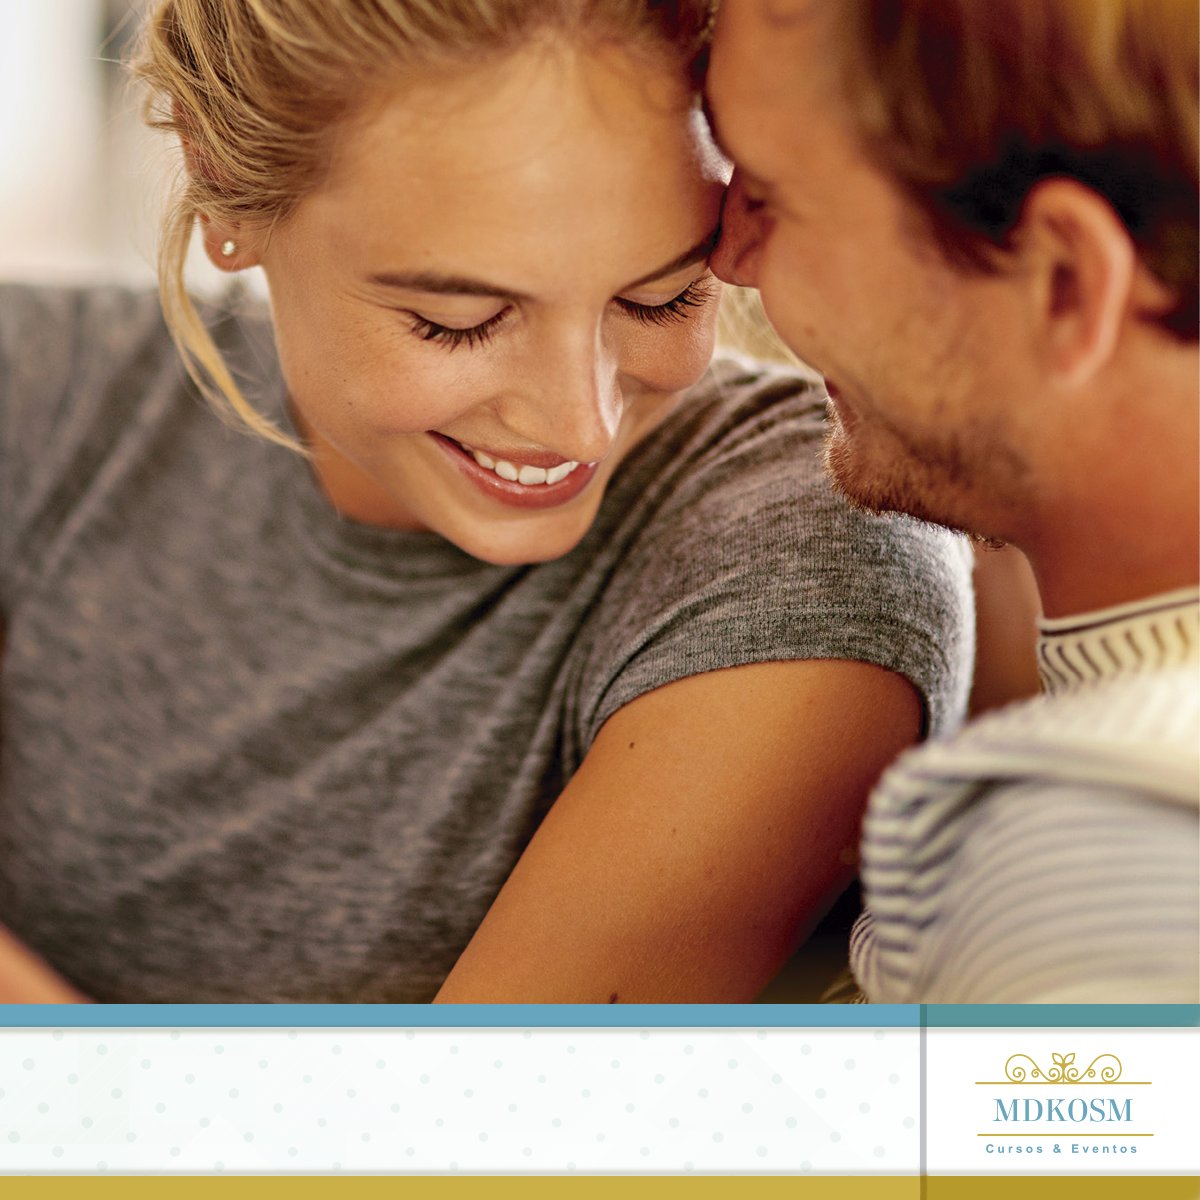 Curso de dermatologia online dating